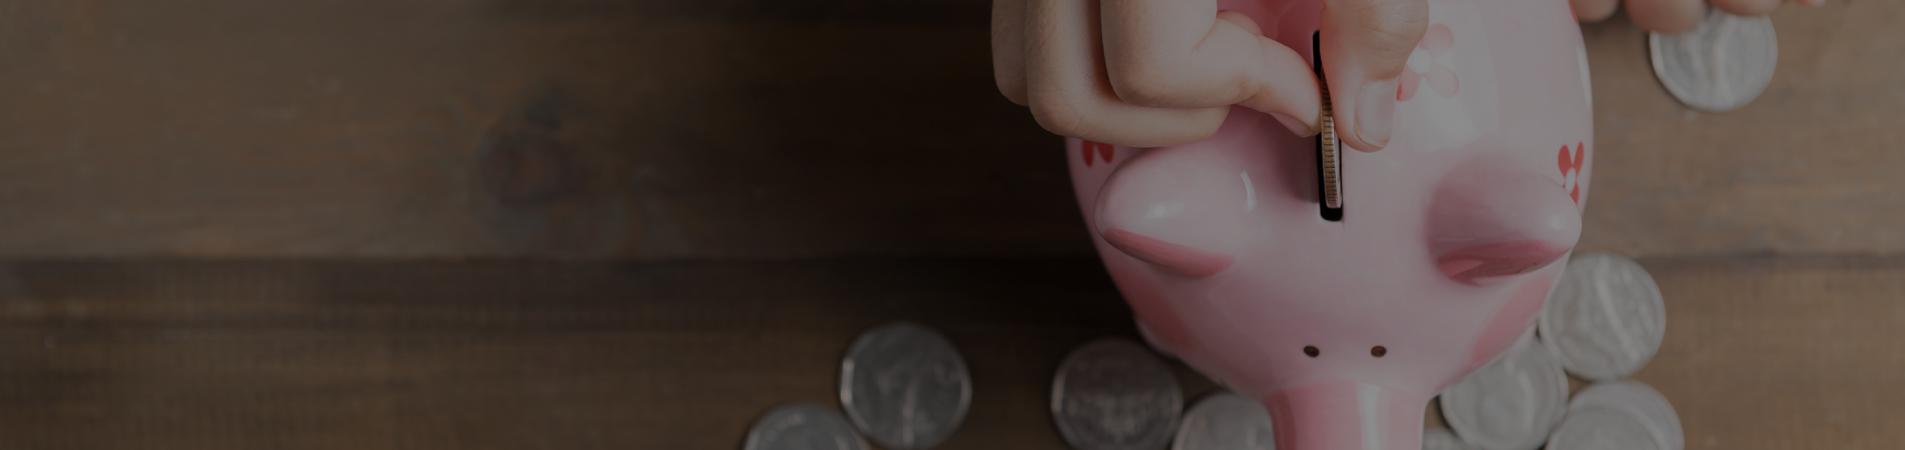 Build Your Savings Account